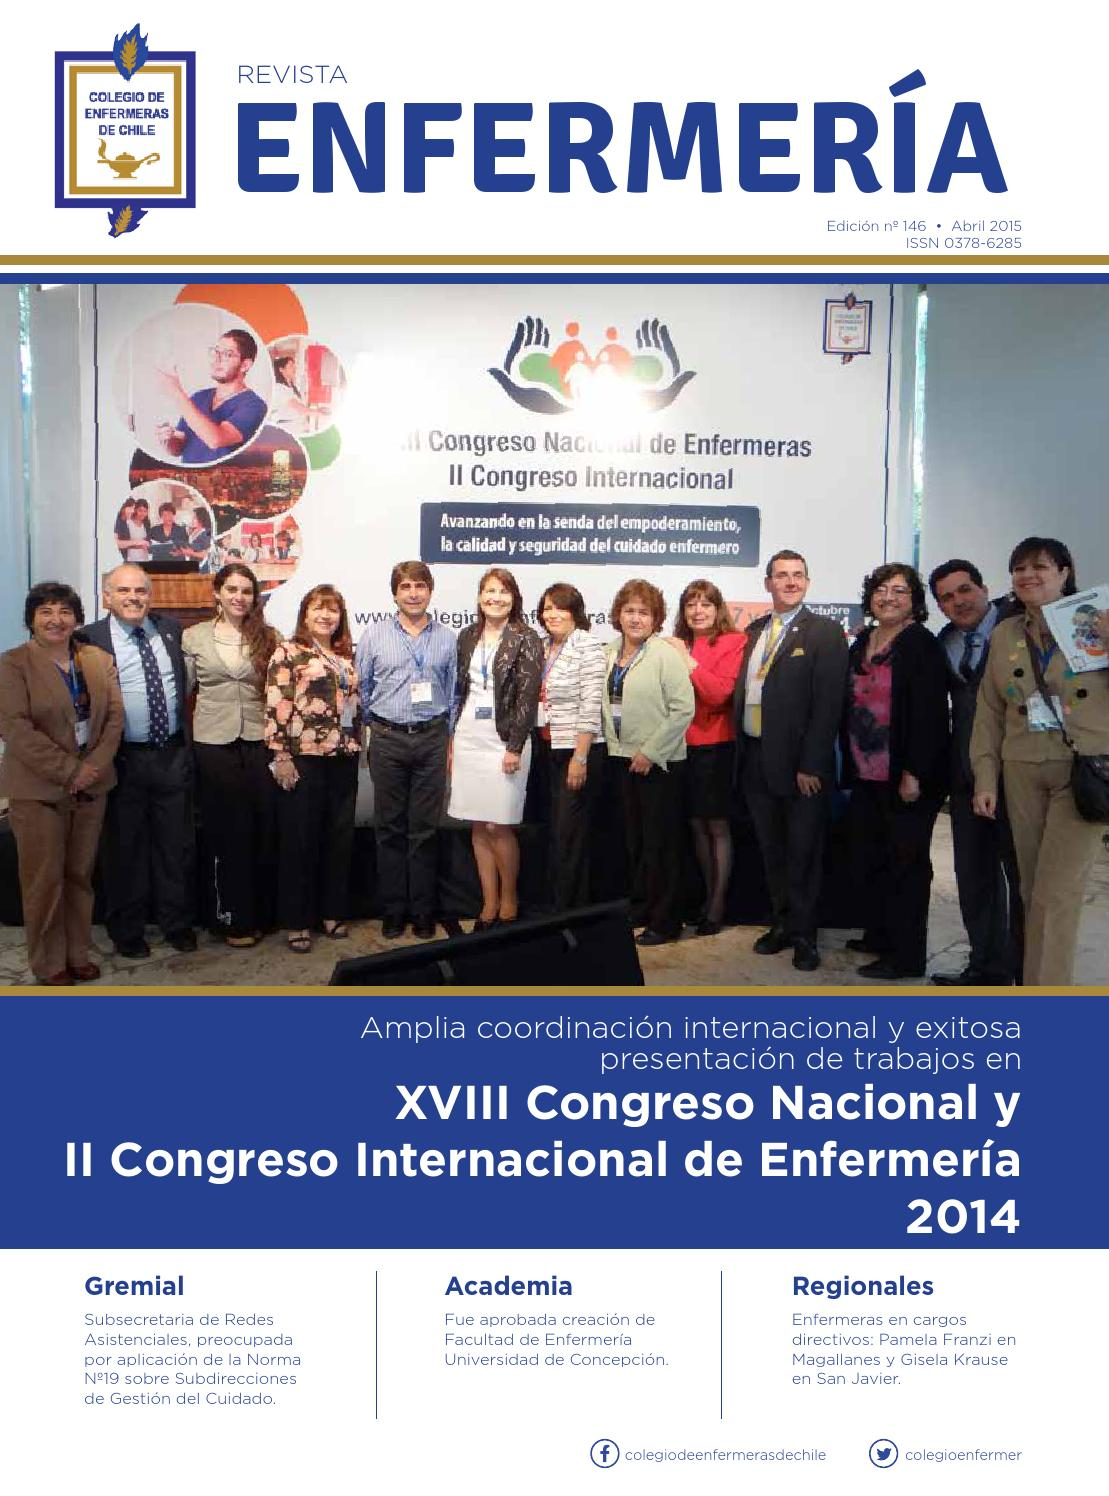 Revista Enfermería 146, abril 2015 by Edirekta Marketing Integral ...